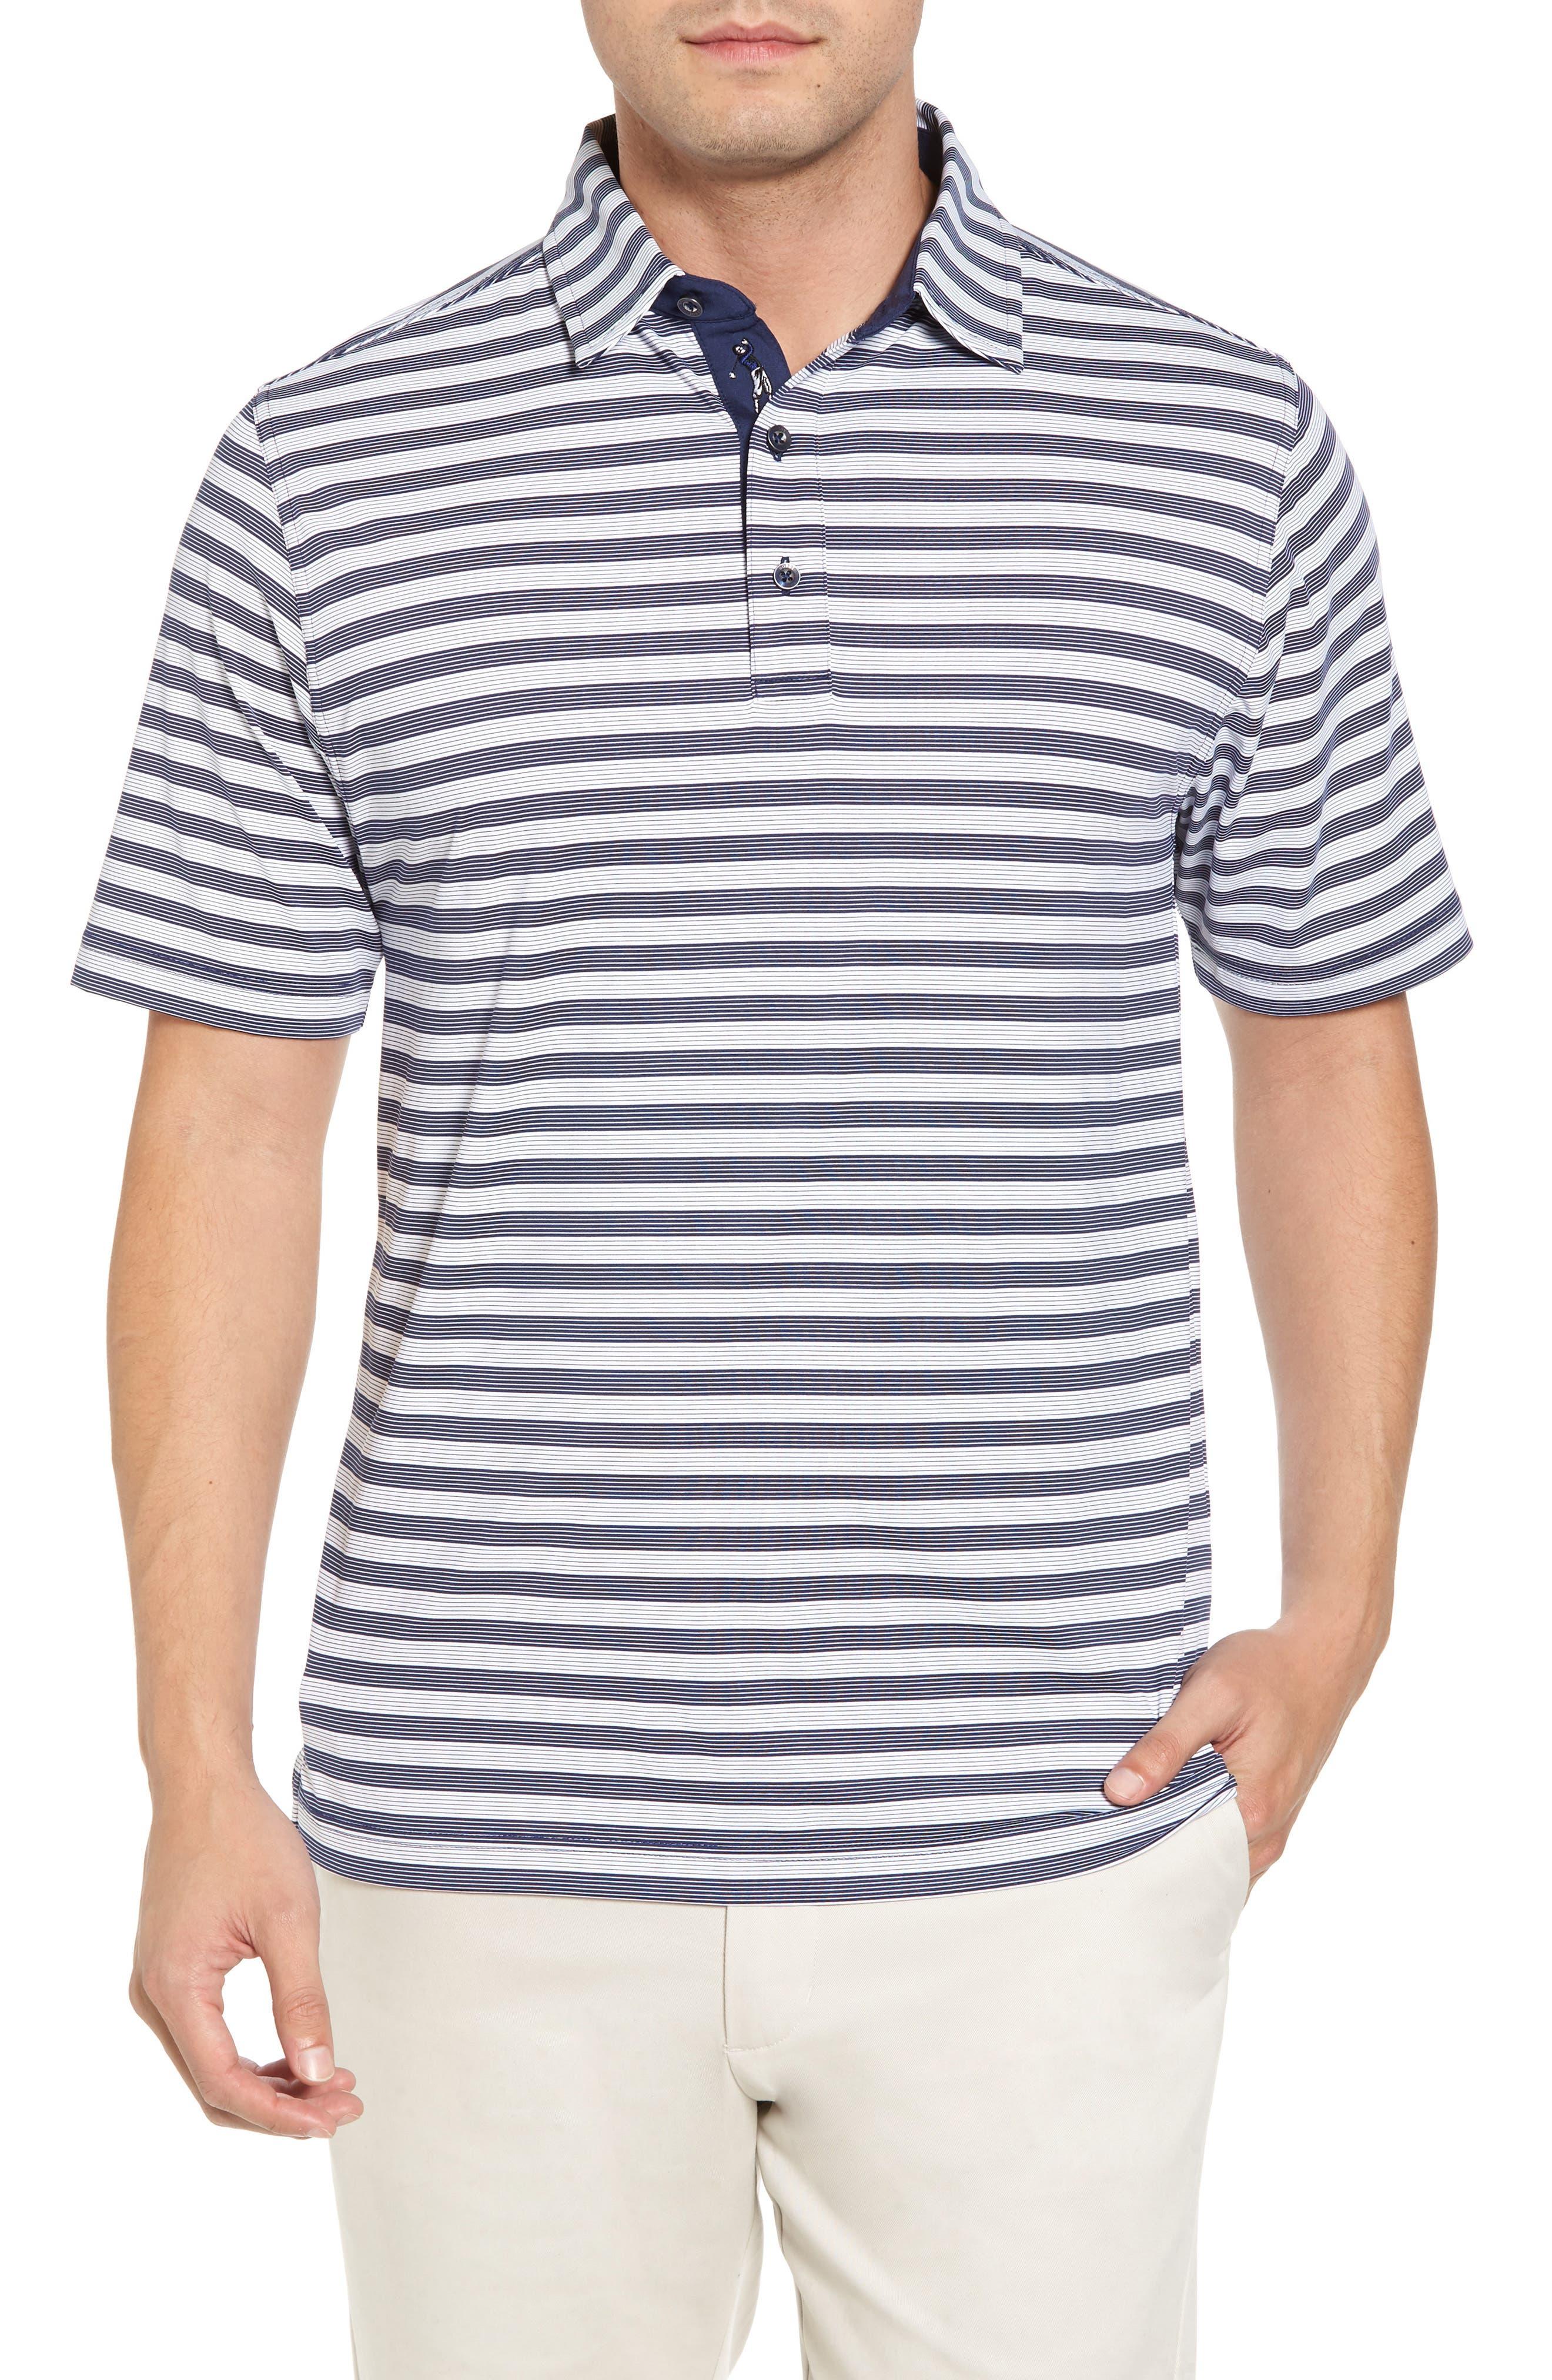 XH2O Del Mar Stripe Jersey Polo,                             Main thumbnail 1, color,                             400